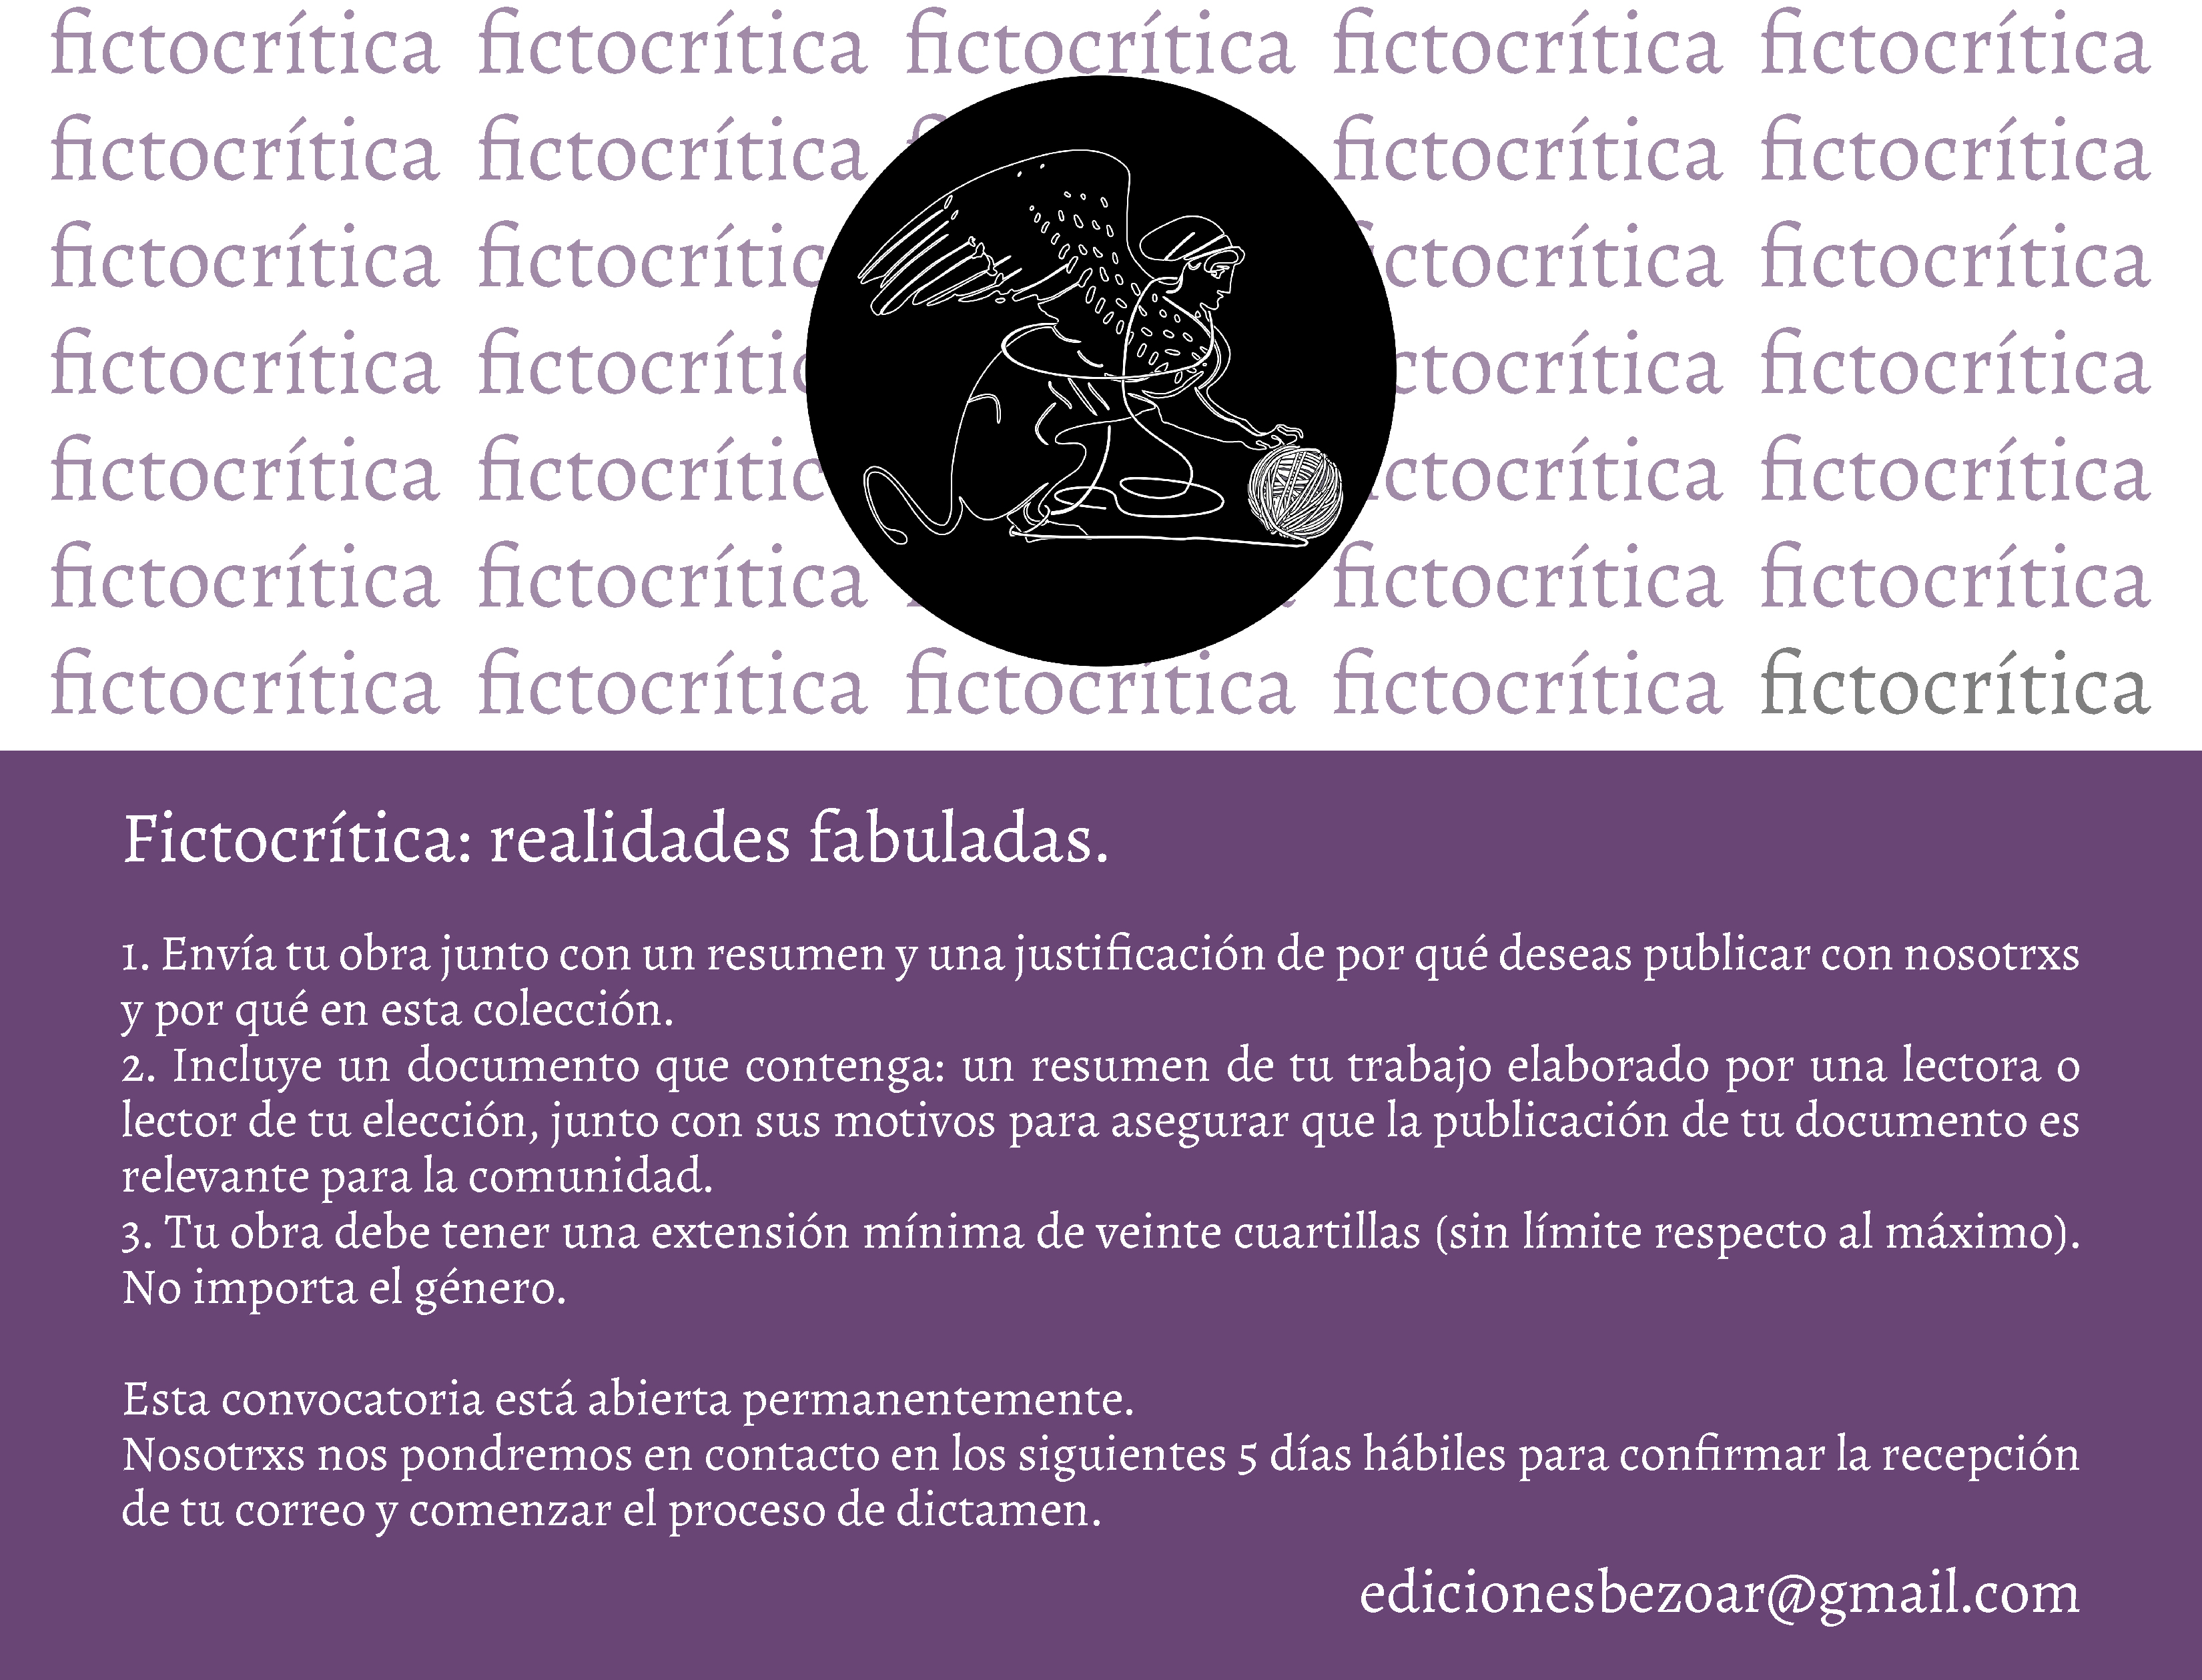 Fictocrítica